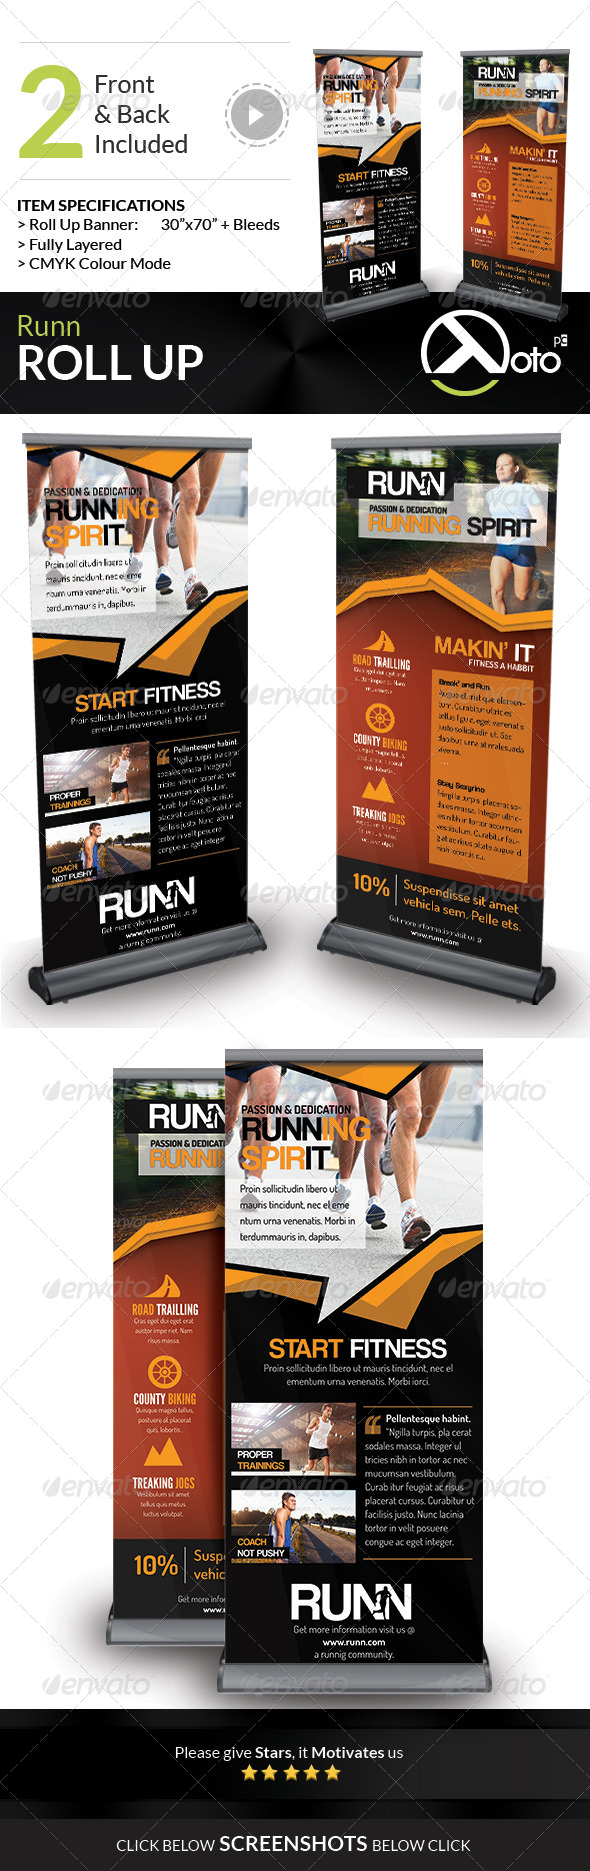 Runn Marathon Running Club Fitness Rollup Banners - Signage Print Templates